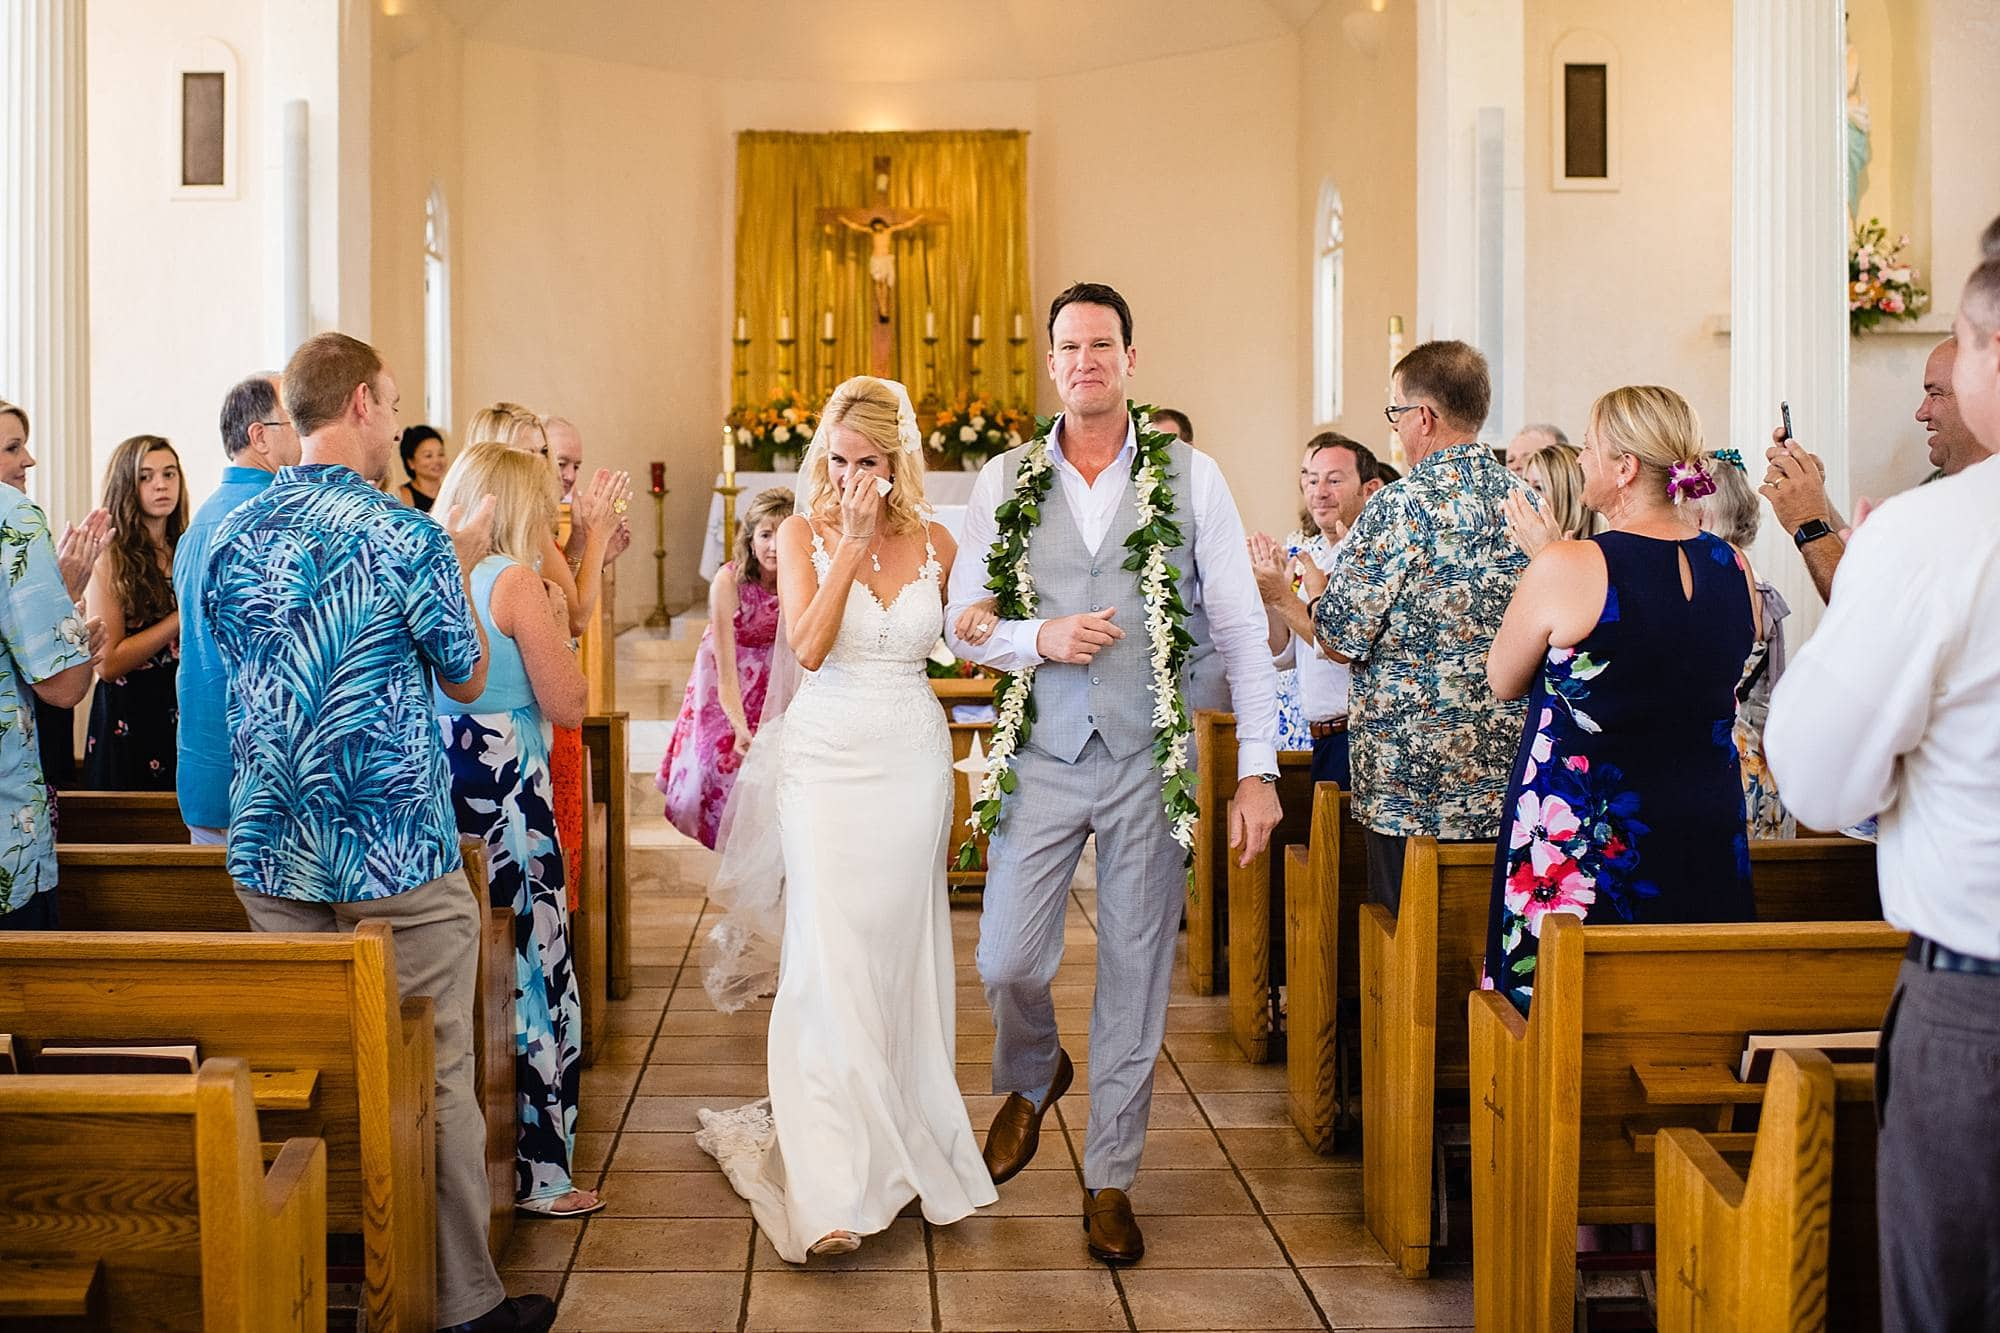 emotional wedding at maria lanikila church